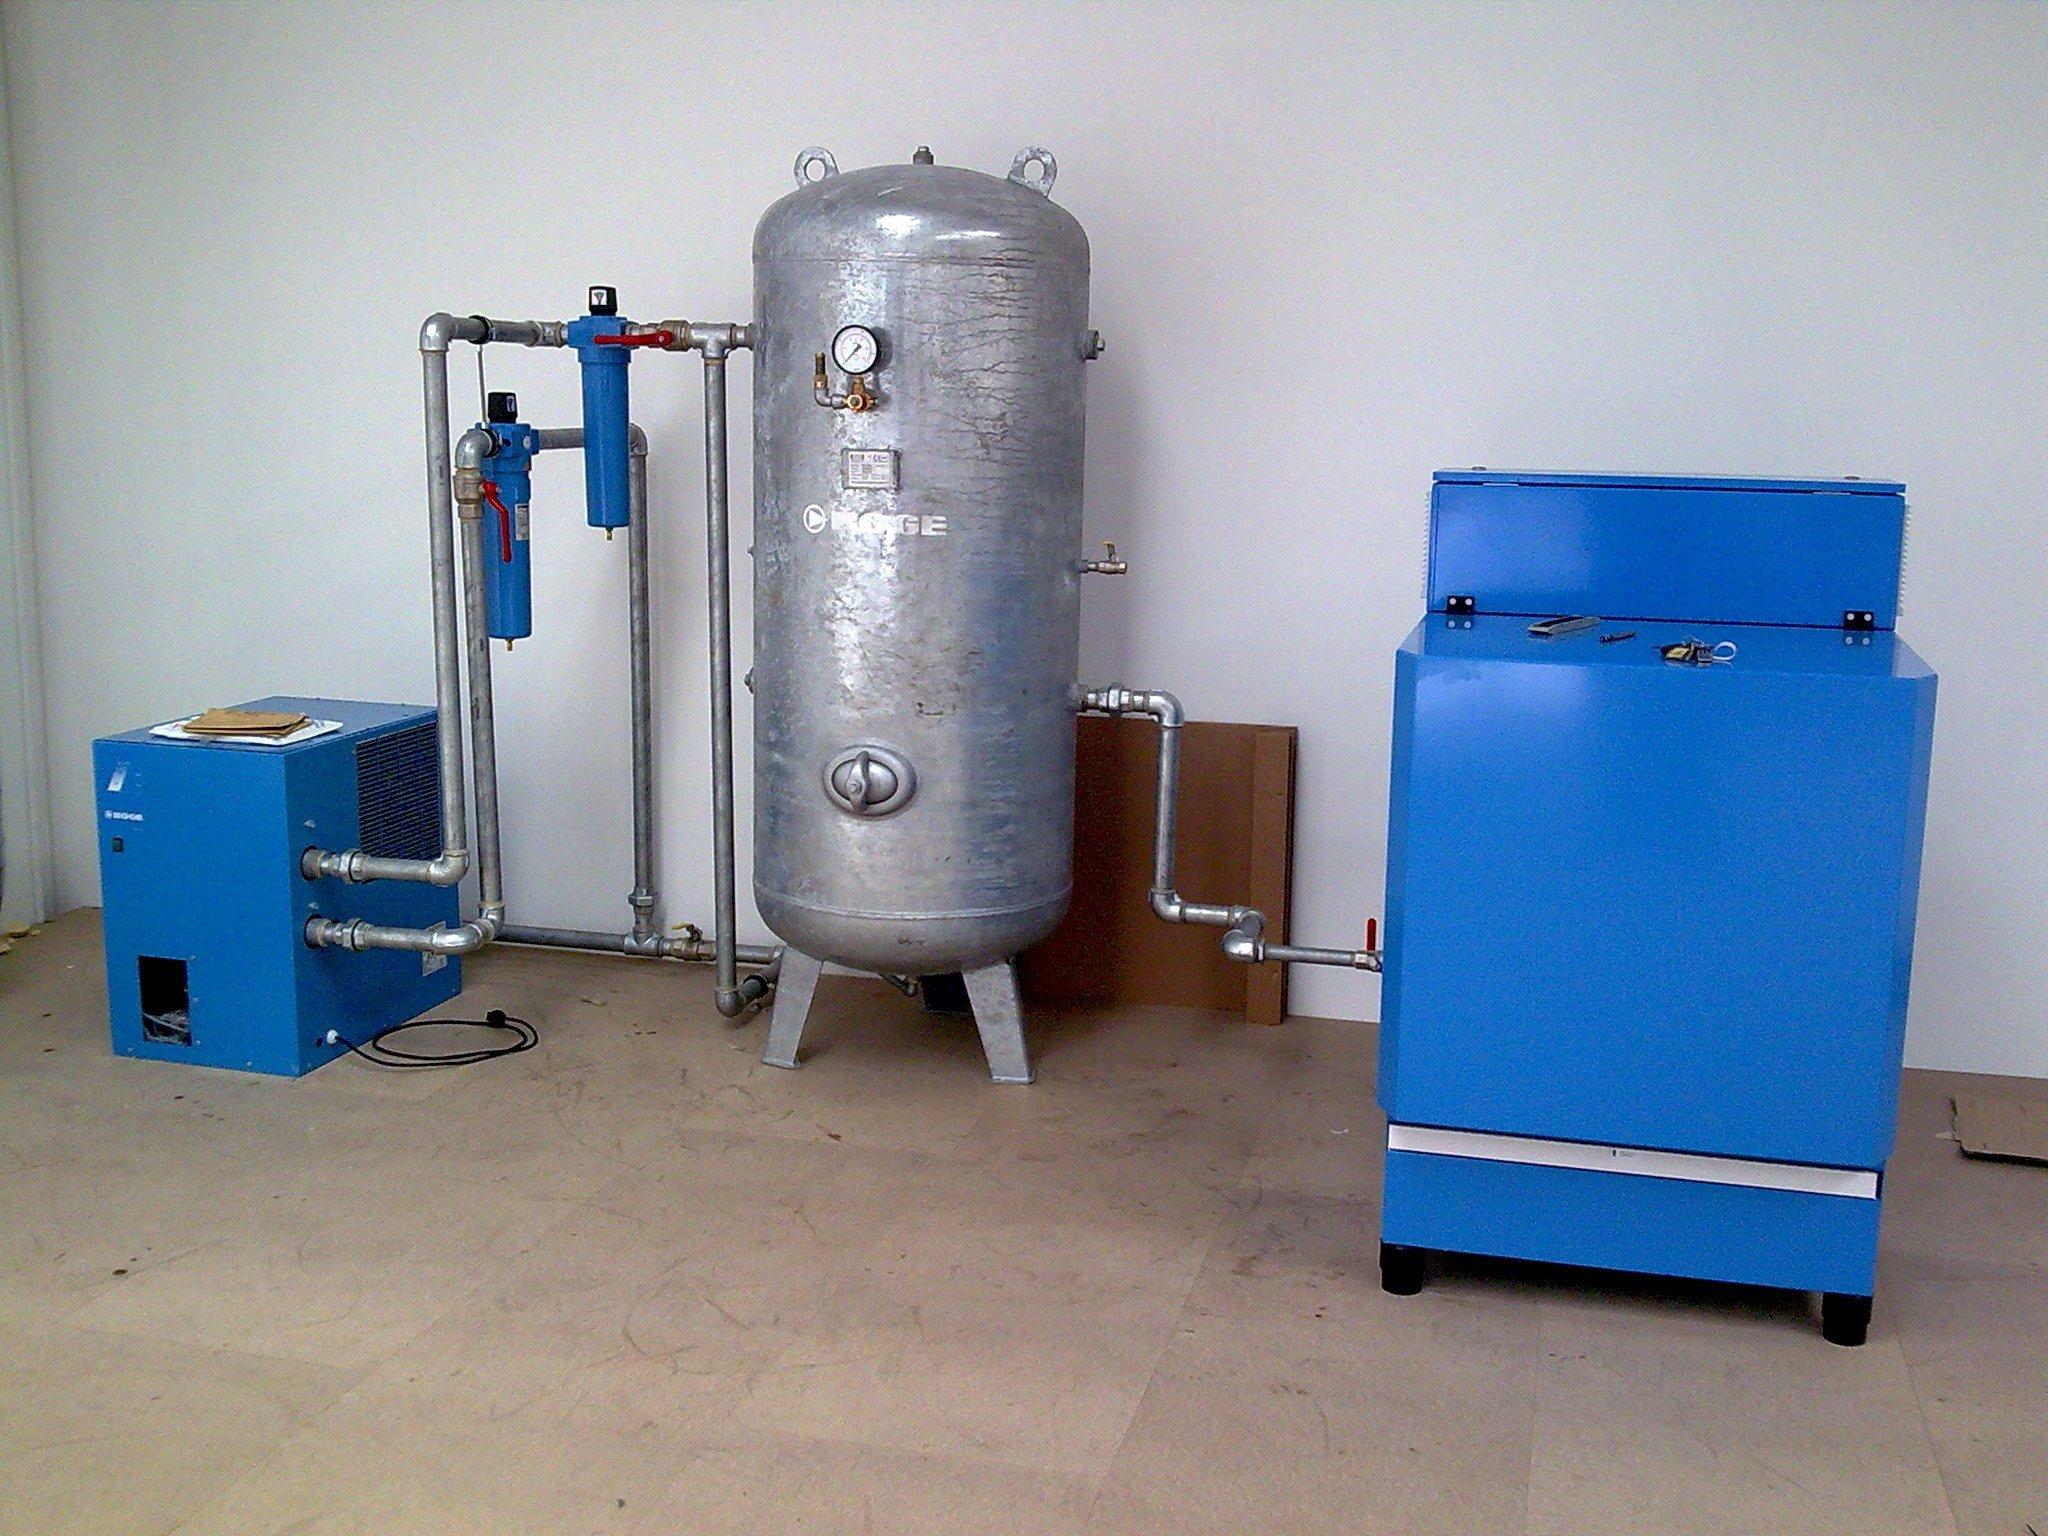 High-capacity air compressor